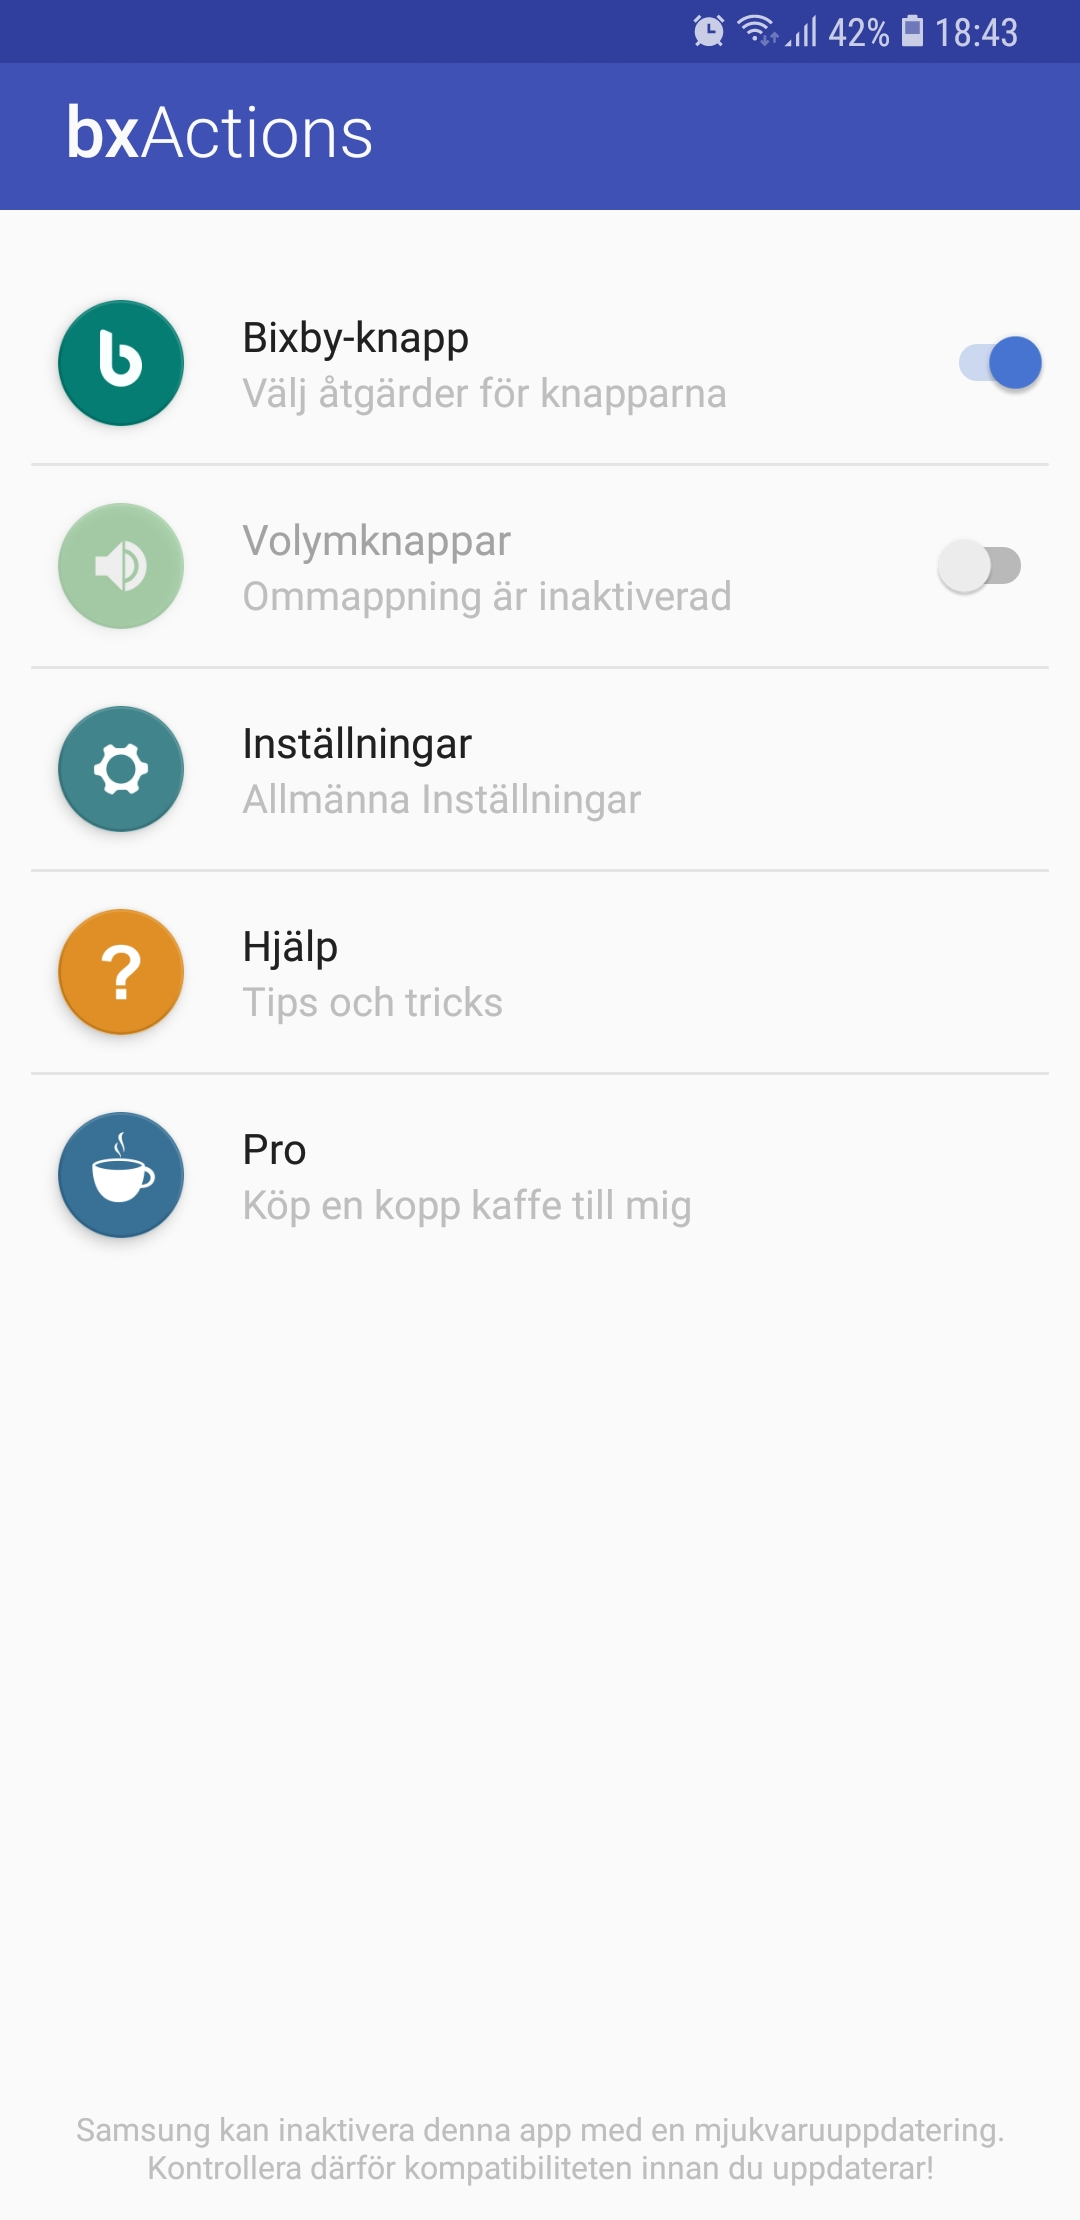 Pixelkänsla med Galaxy Note 9 utan root [Guide] | Swedroid forum